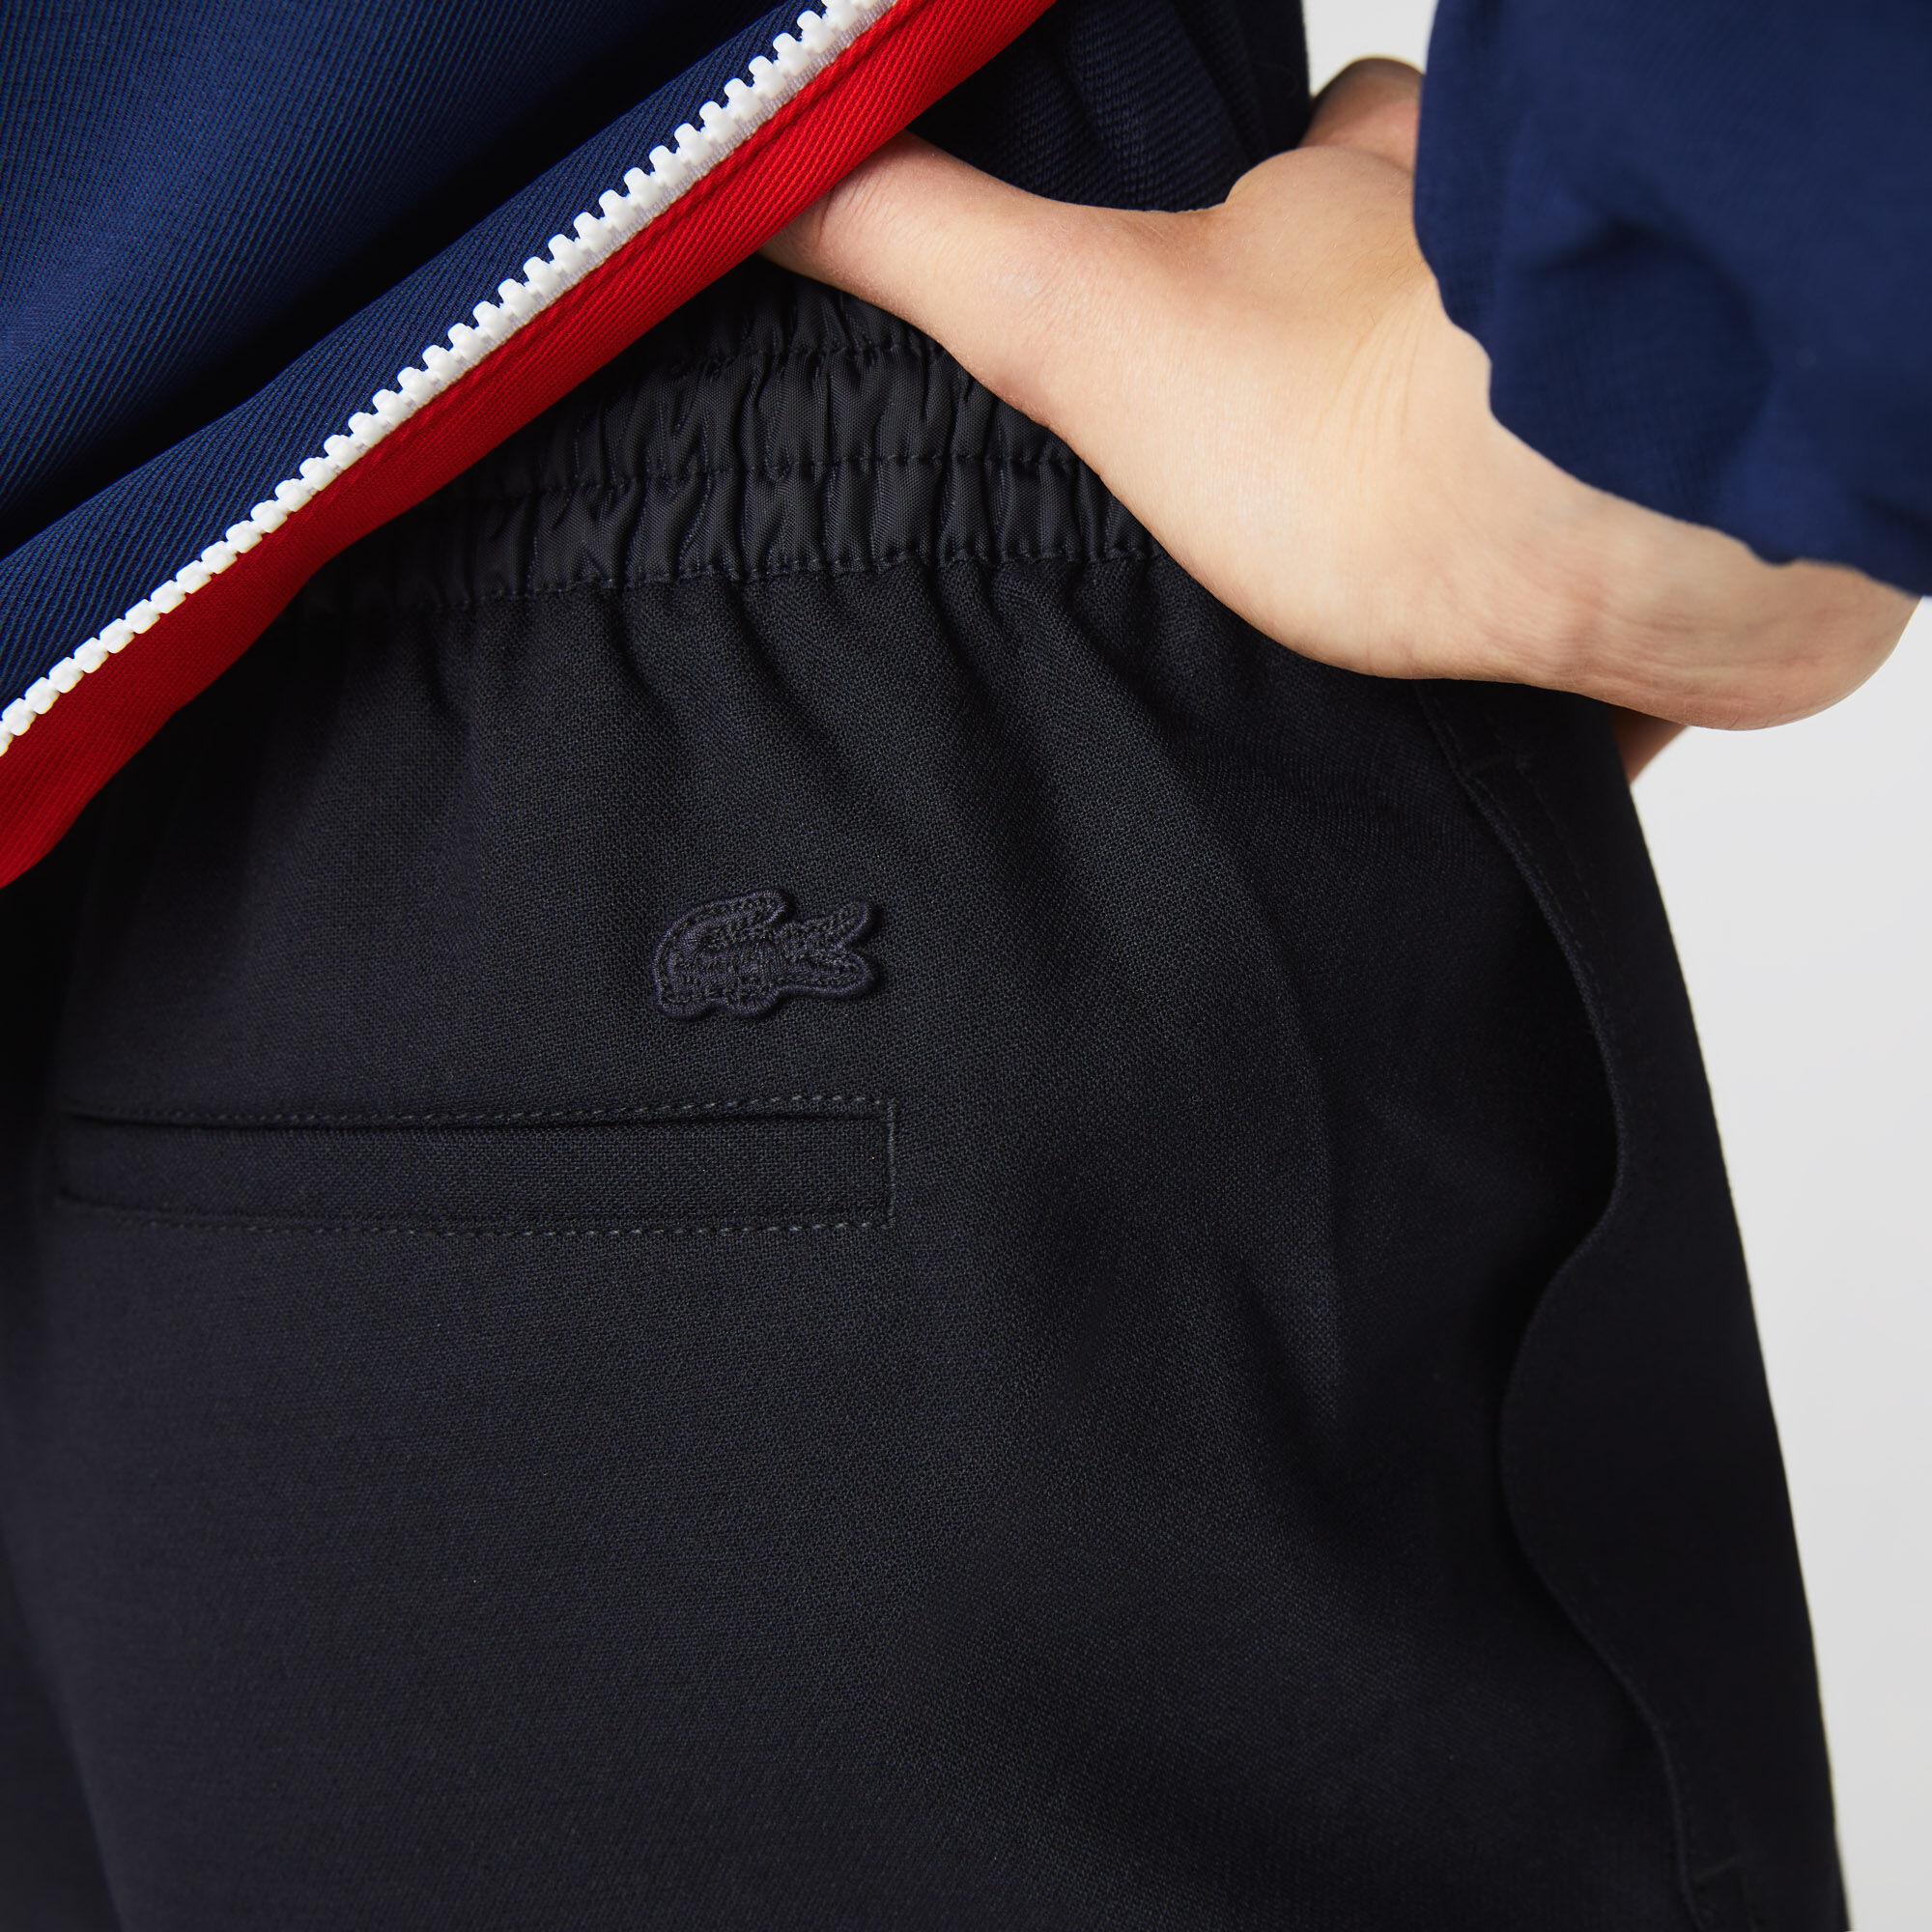 Women's Wool Blend Lightweight City Athletic Pants